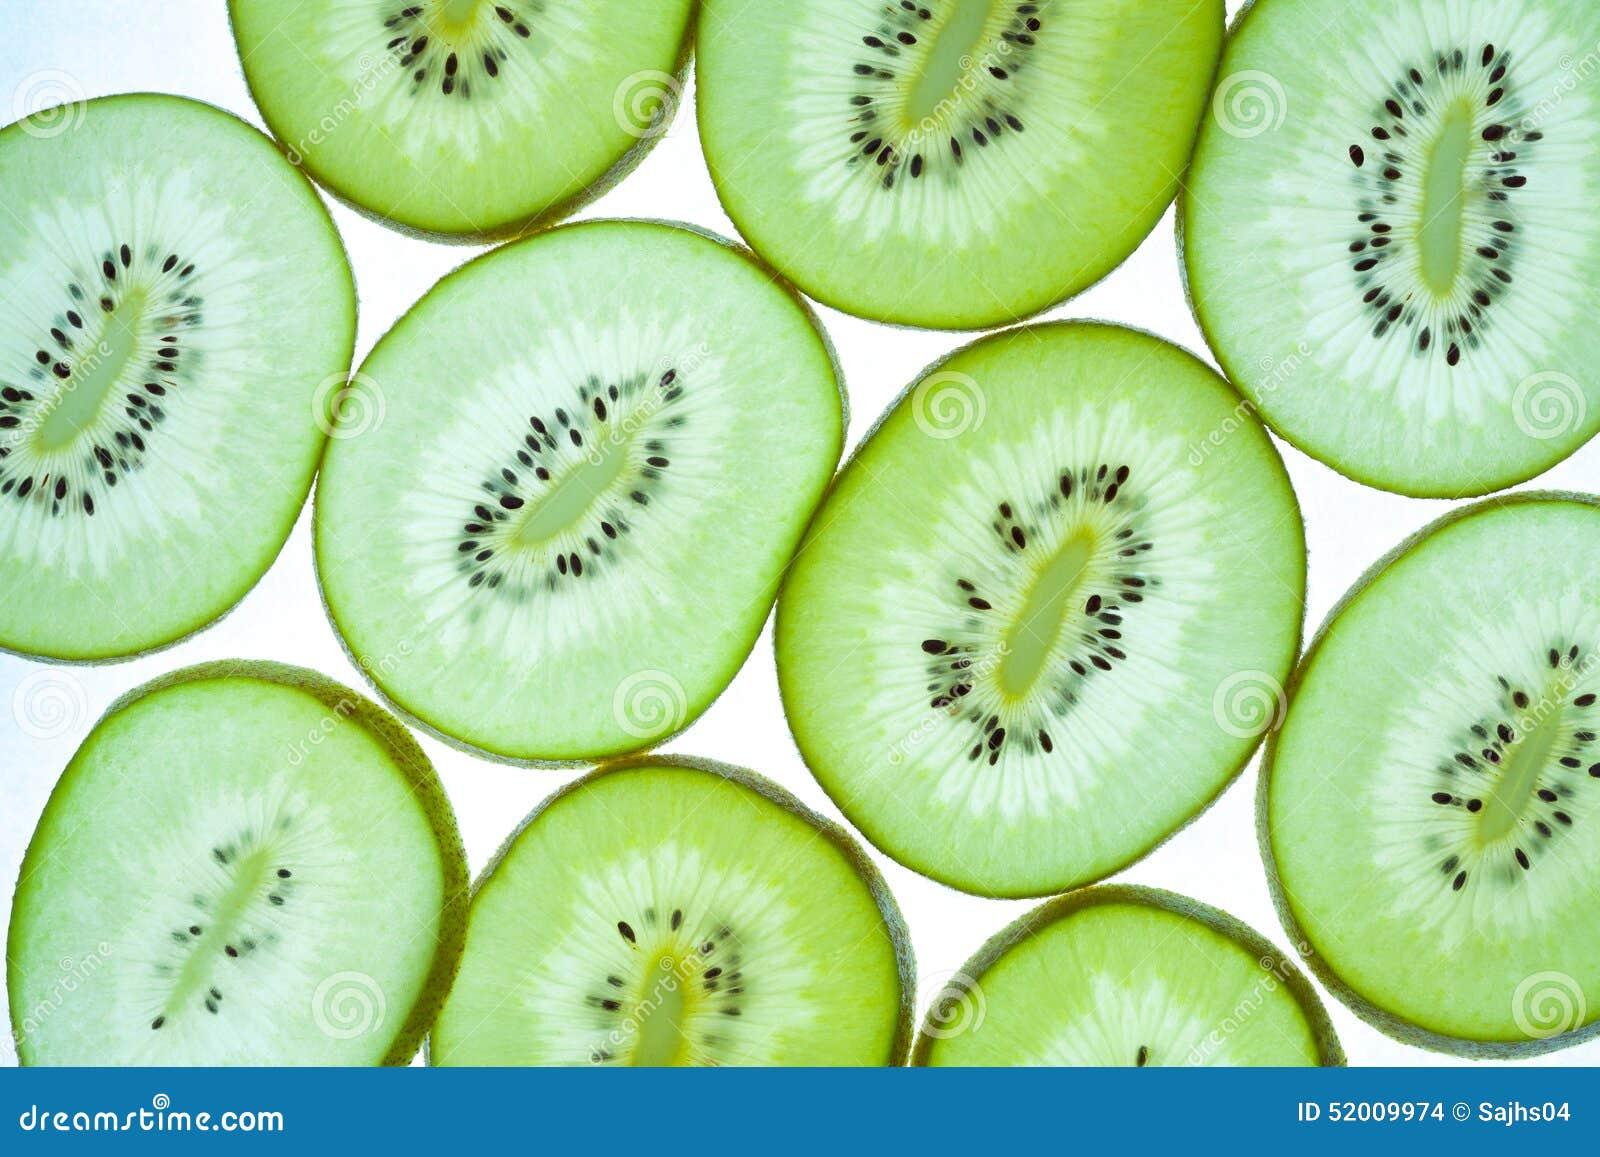 Seamless pattern of sliced green kiwifruit